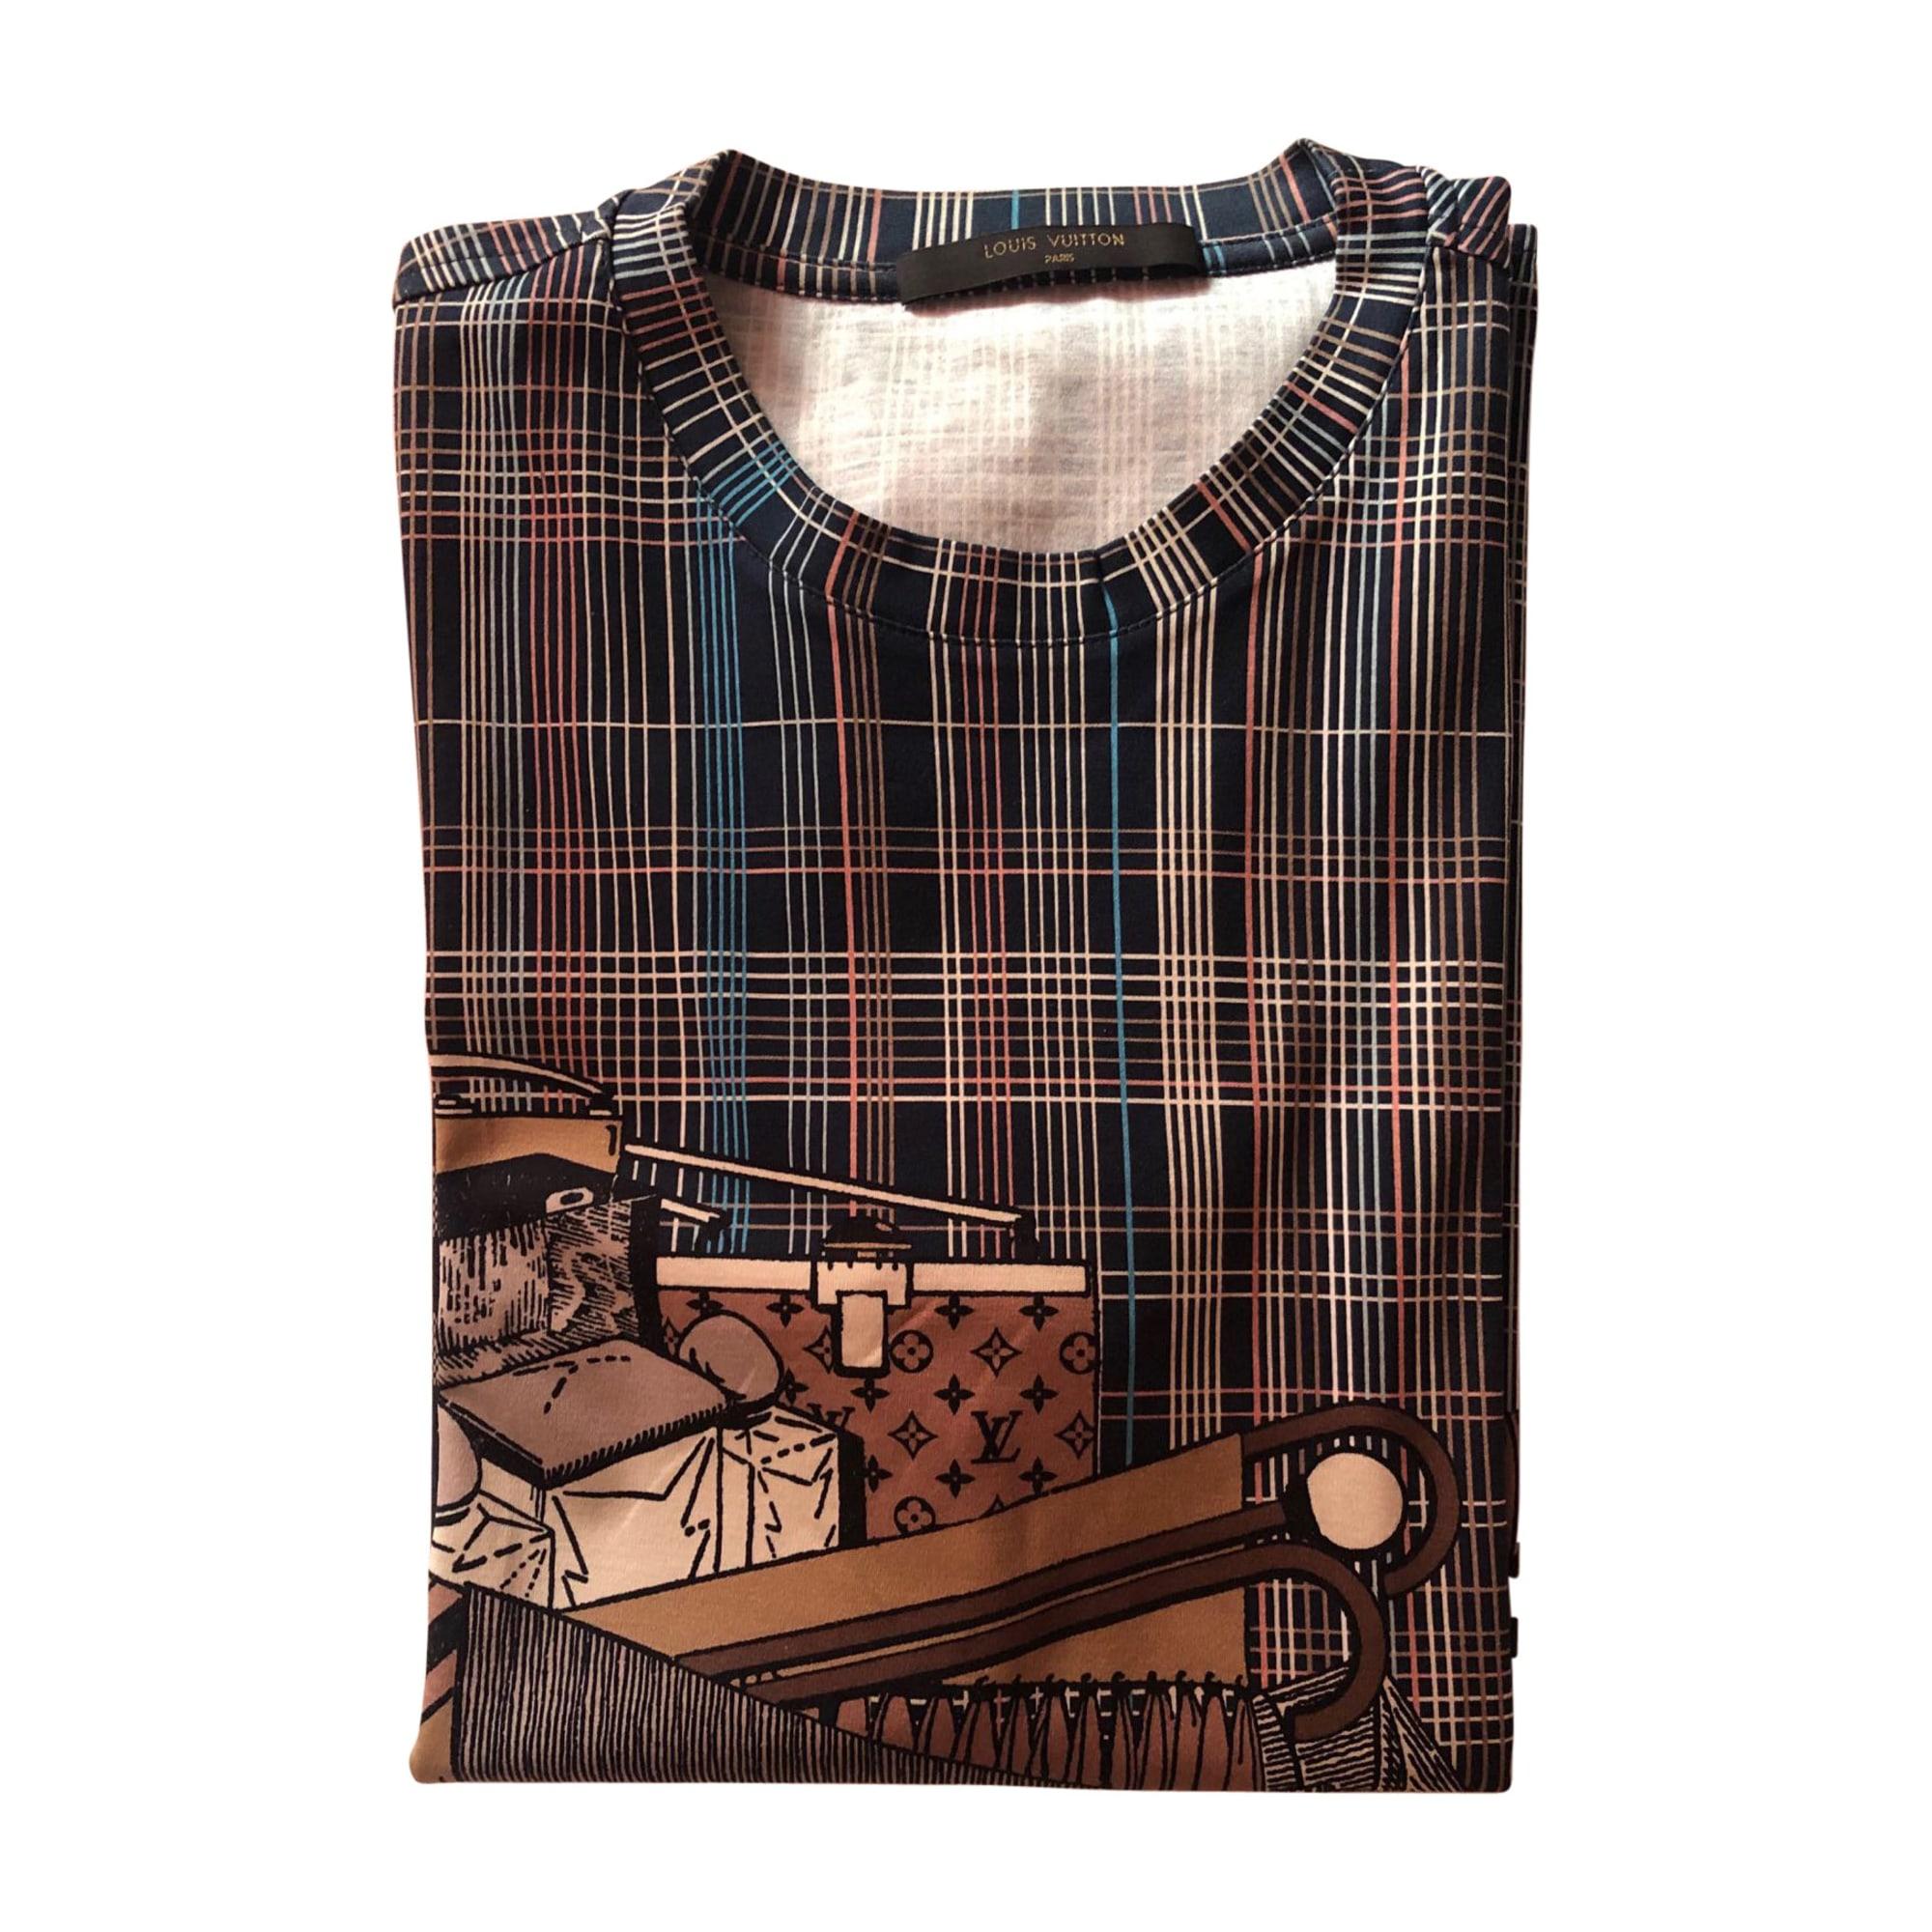 Tee-shirt LOUIS VUITTON Marron, kaki